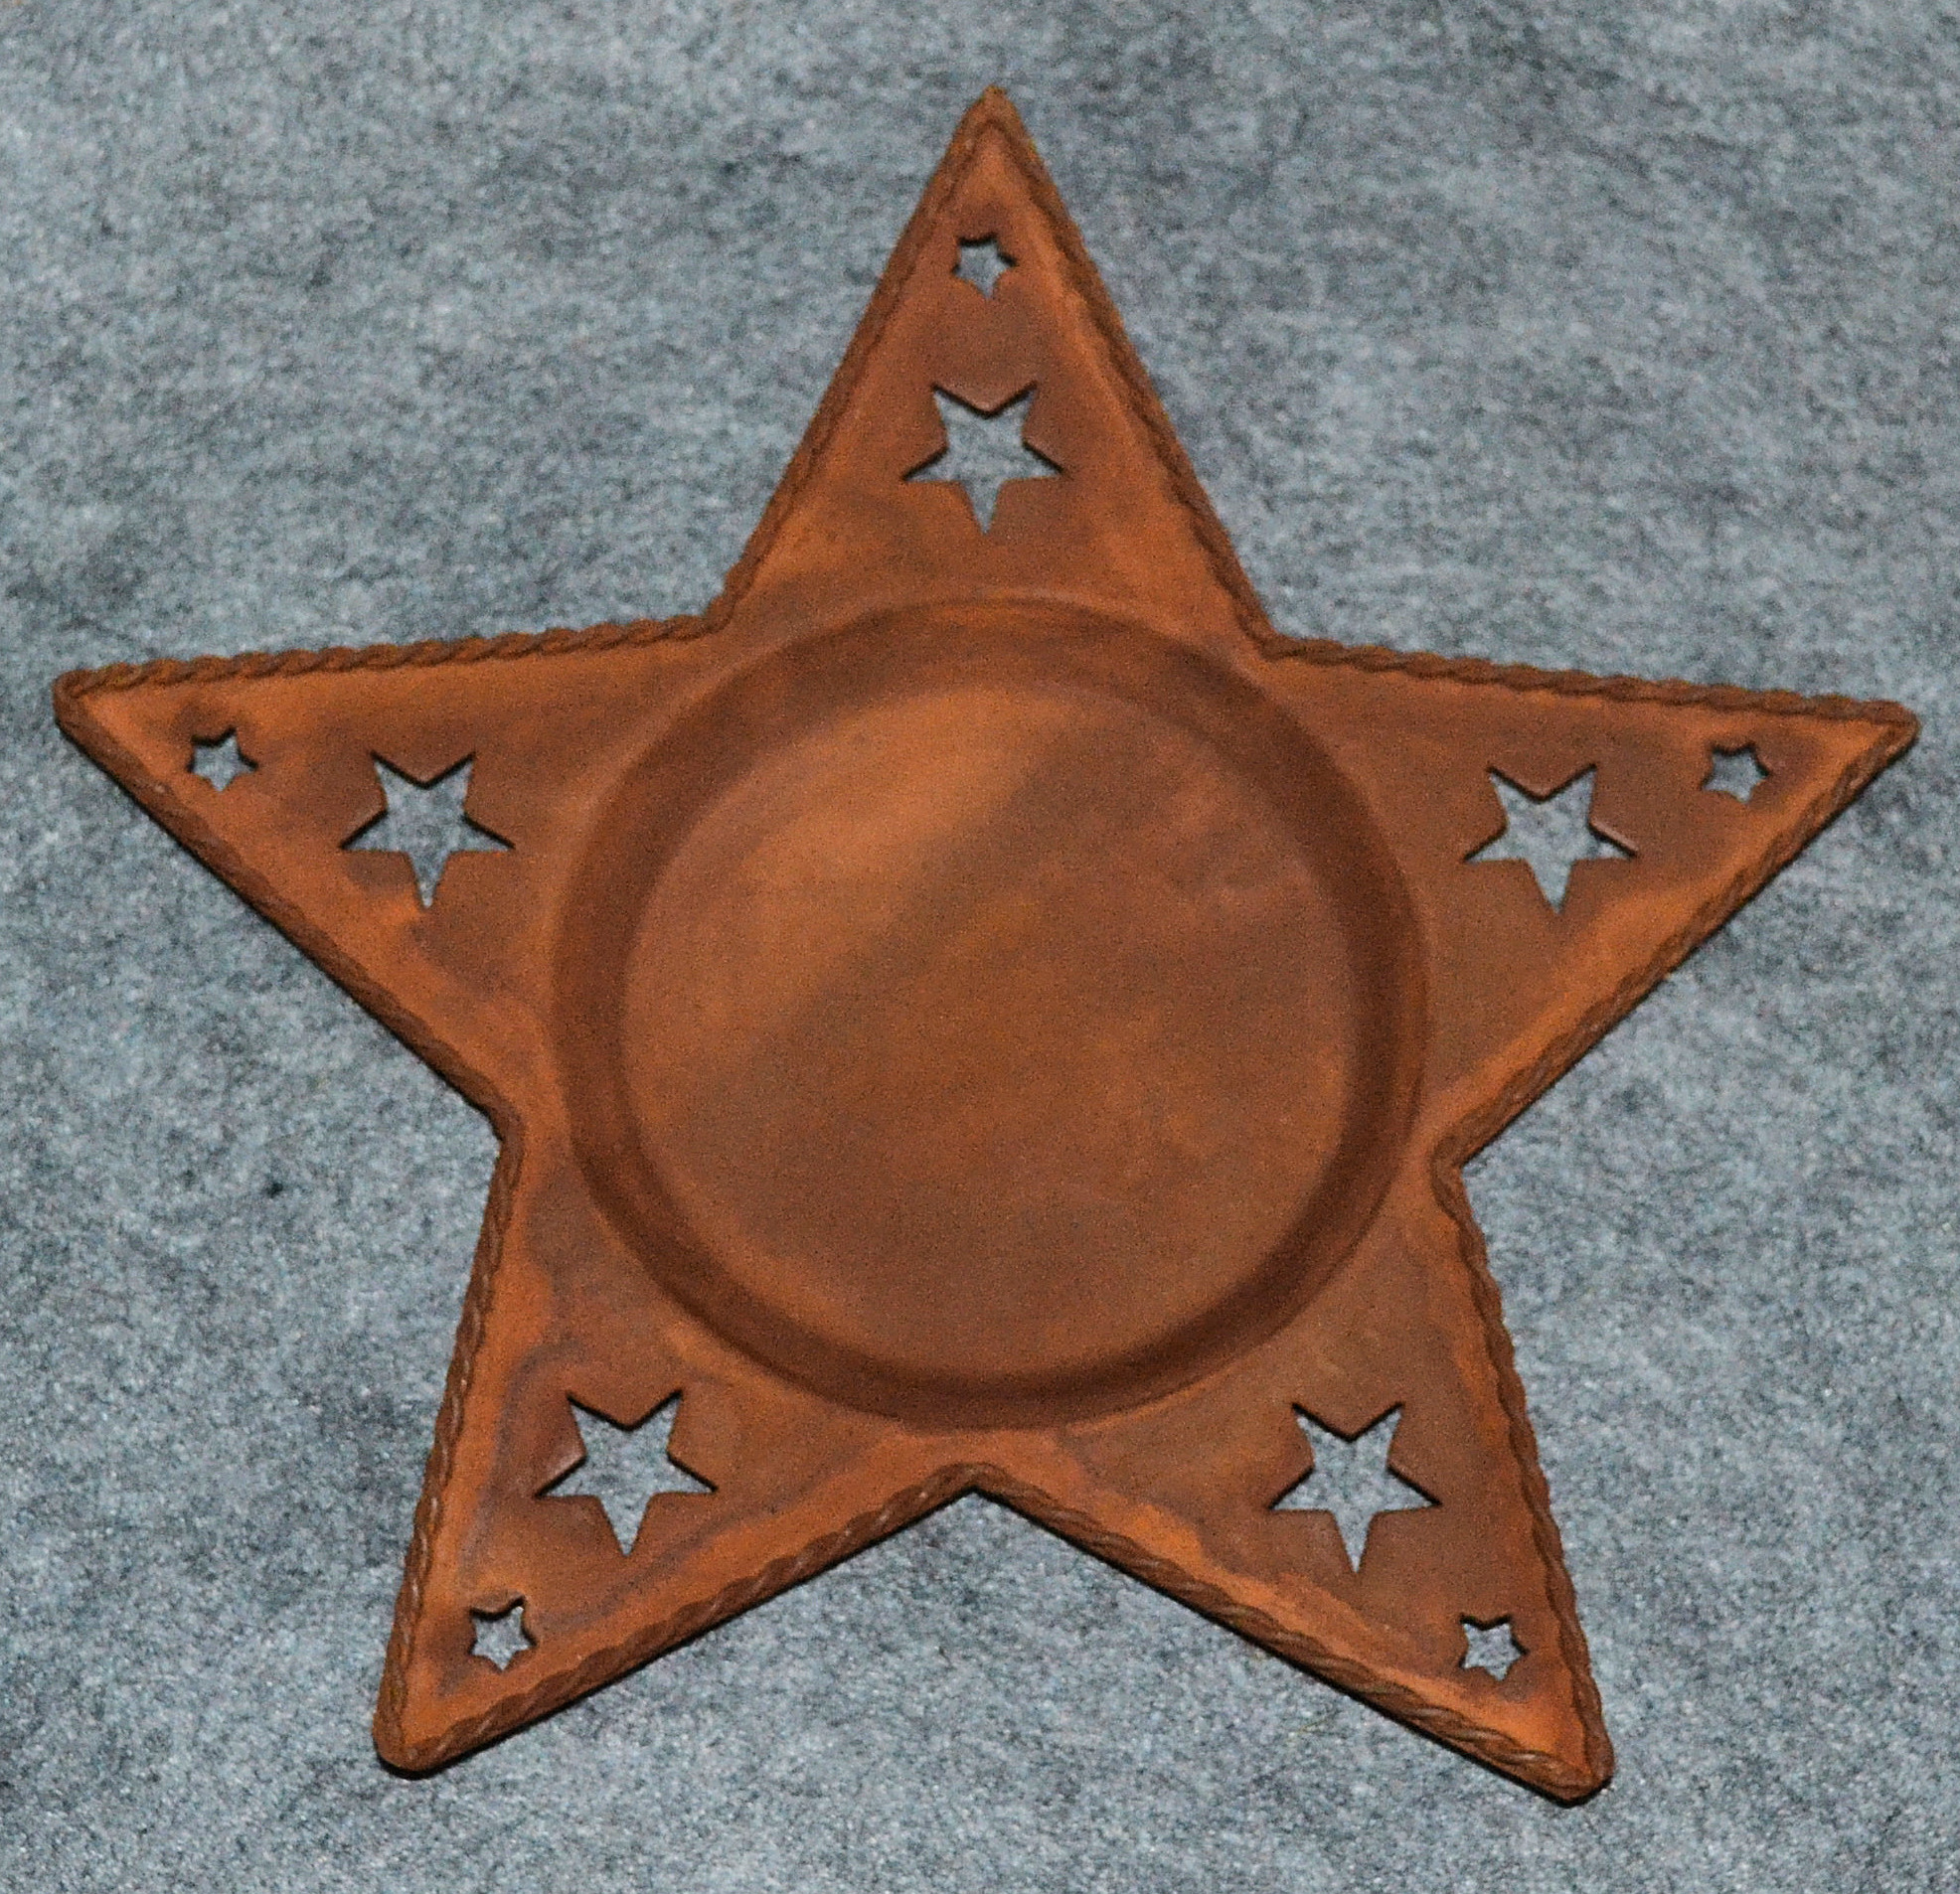 metal-rusty-star-202005.jpg